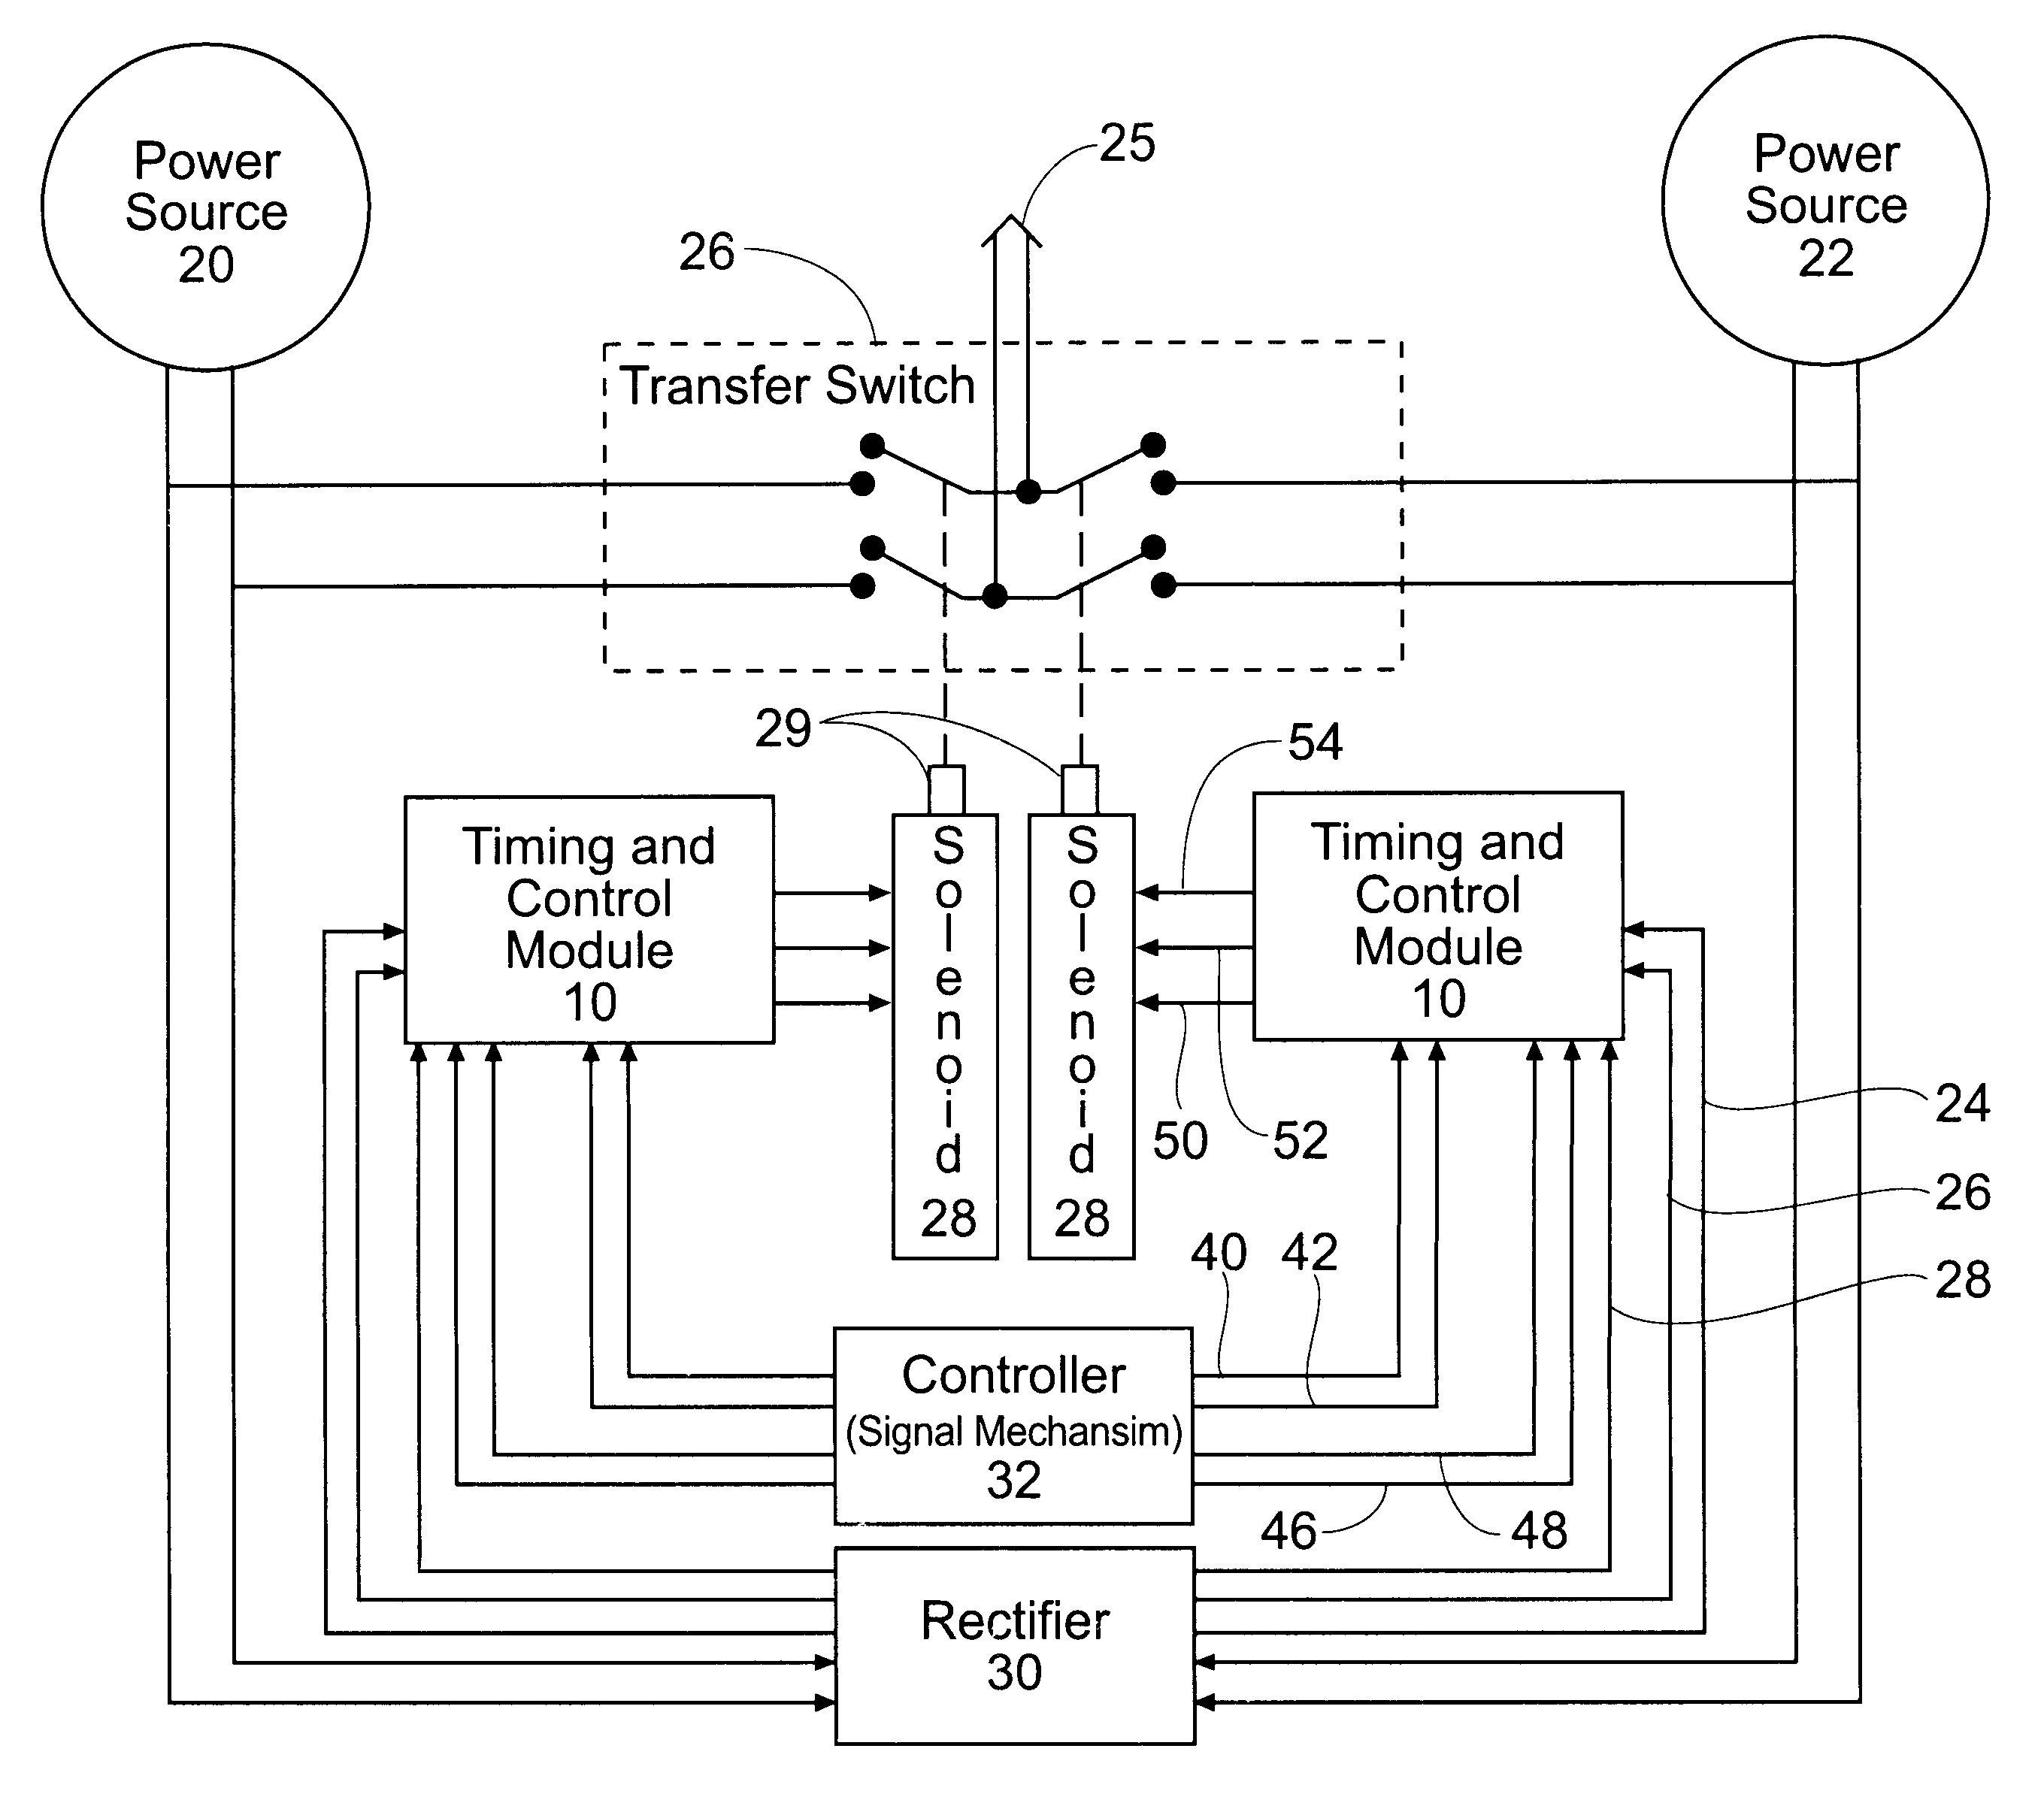 [DIAGRAM_5UK]  5915A59 Generac Automatic Transfer Switch Wiring Diagram Zenith ... | Wiring  Library | Zenith Ats Wiring Diagram |  | Wiring Library